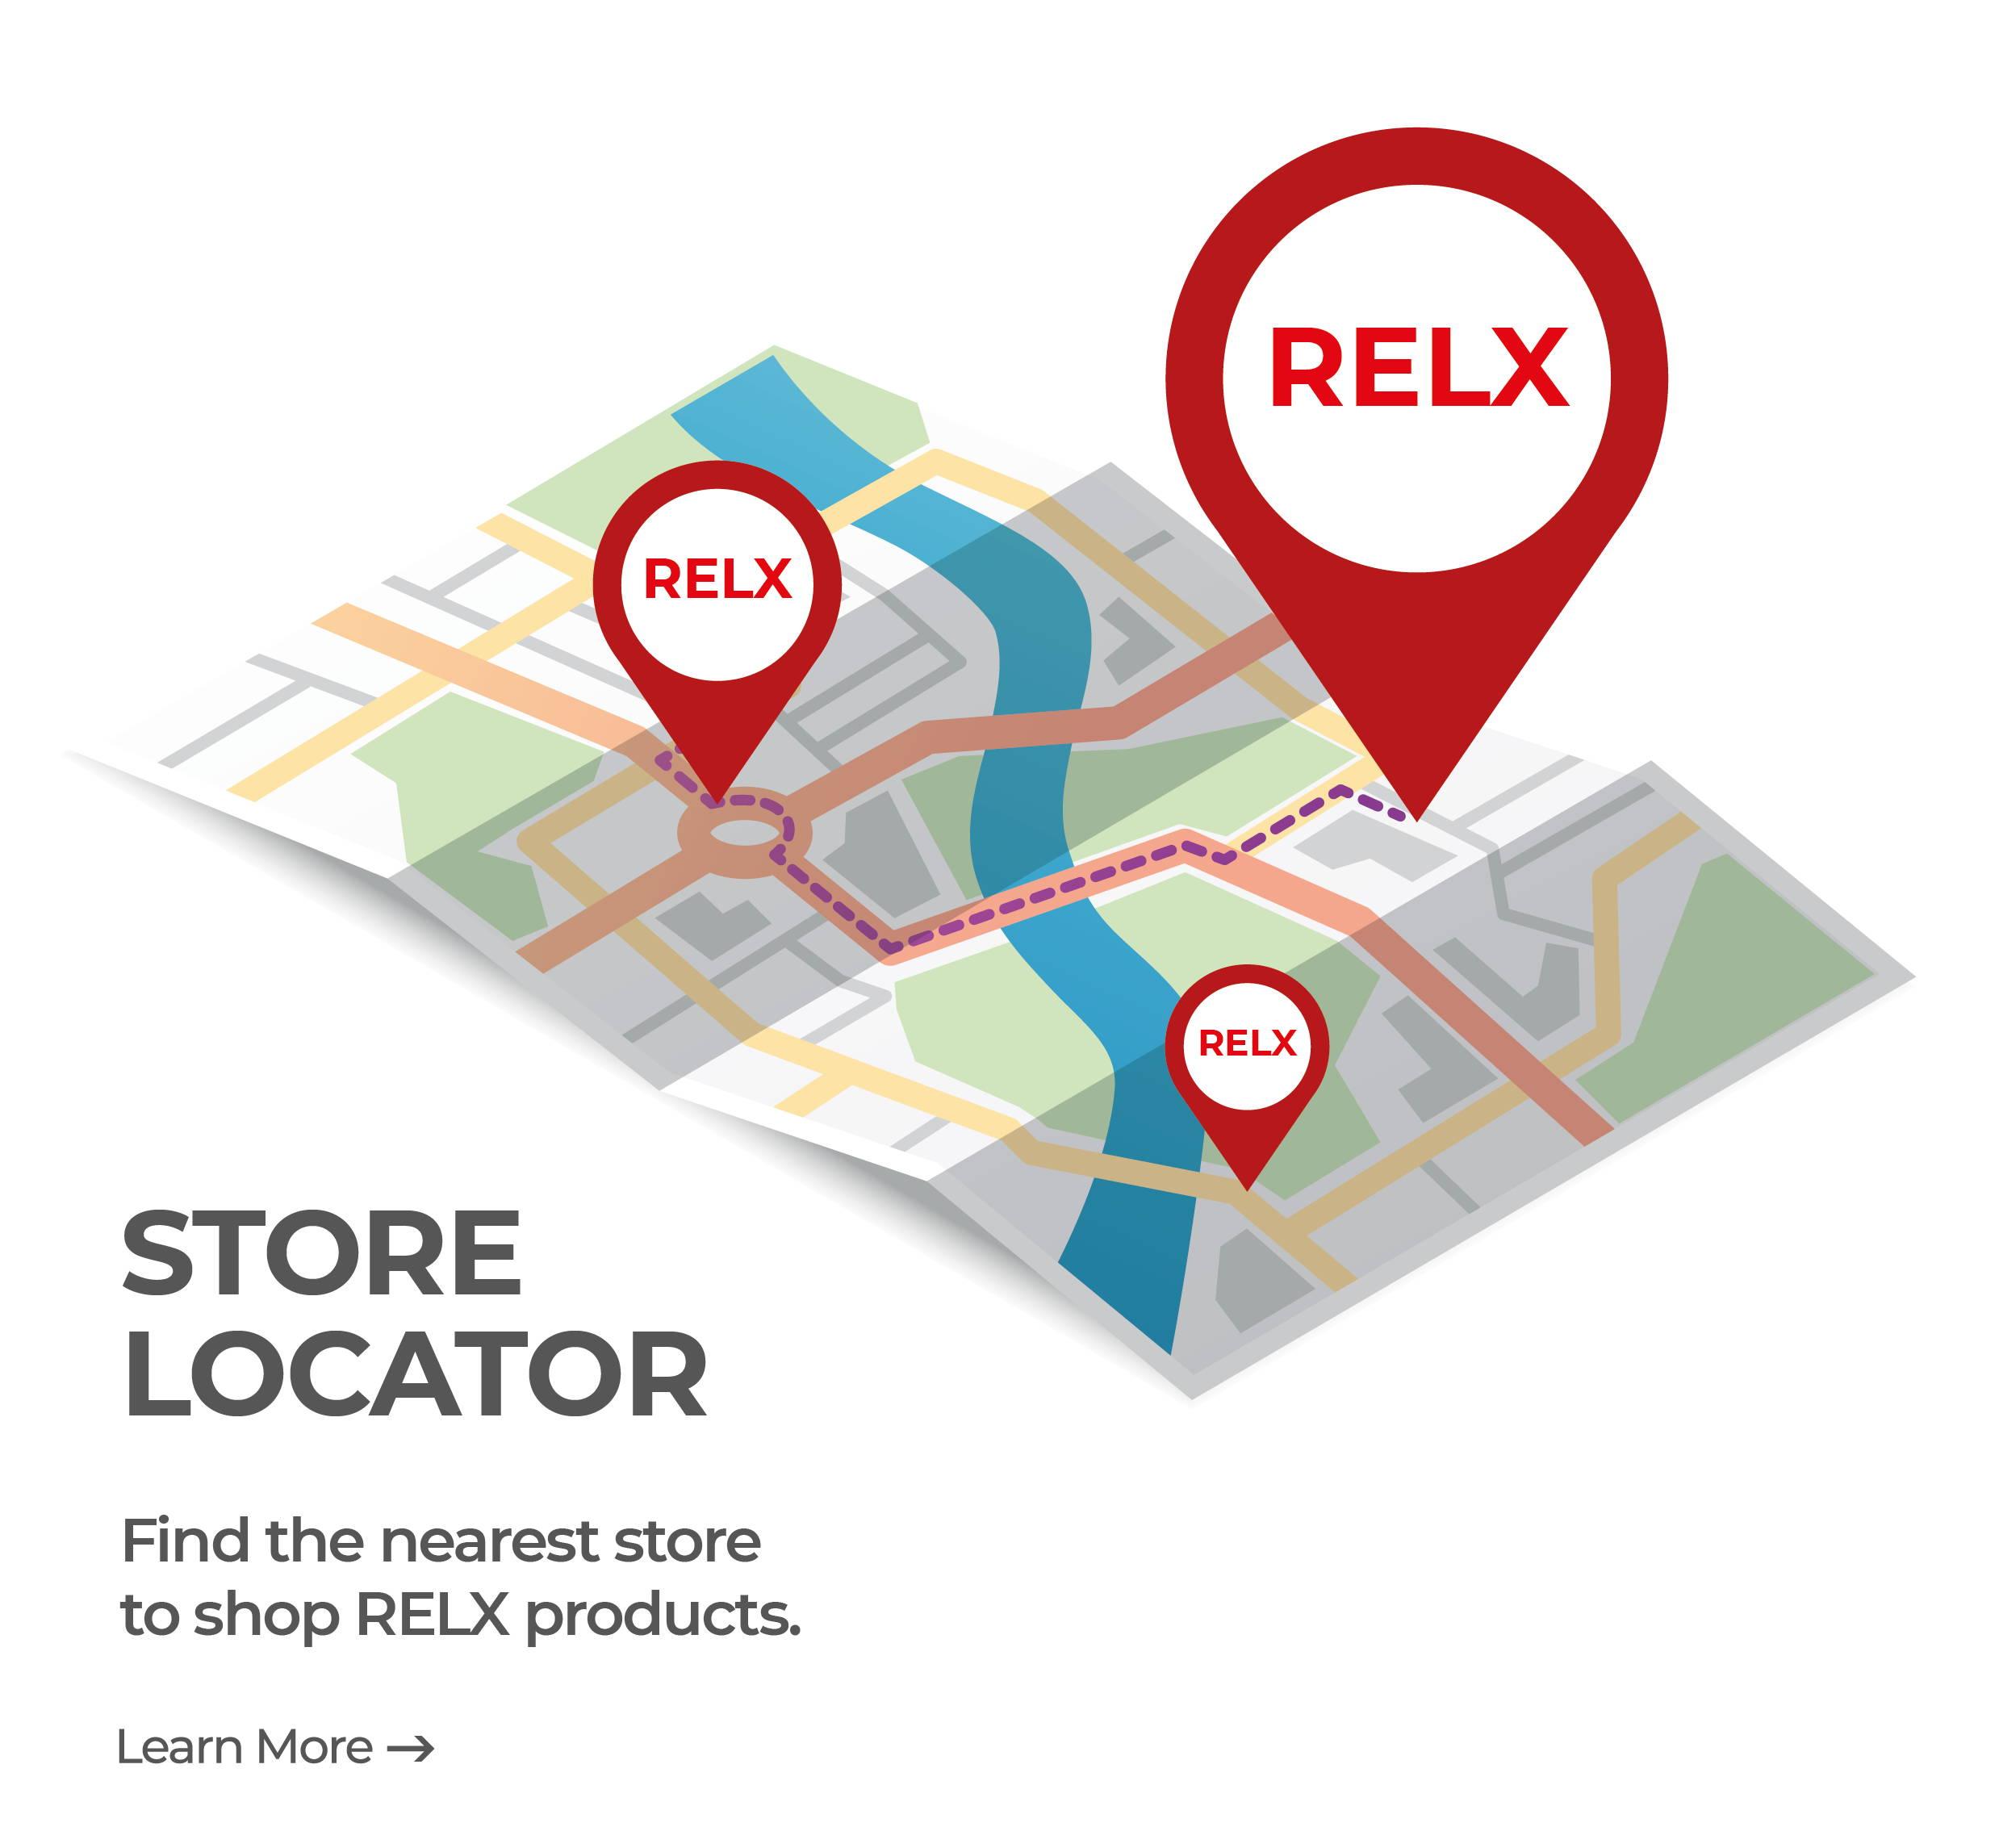 Find the nearest store near me.